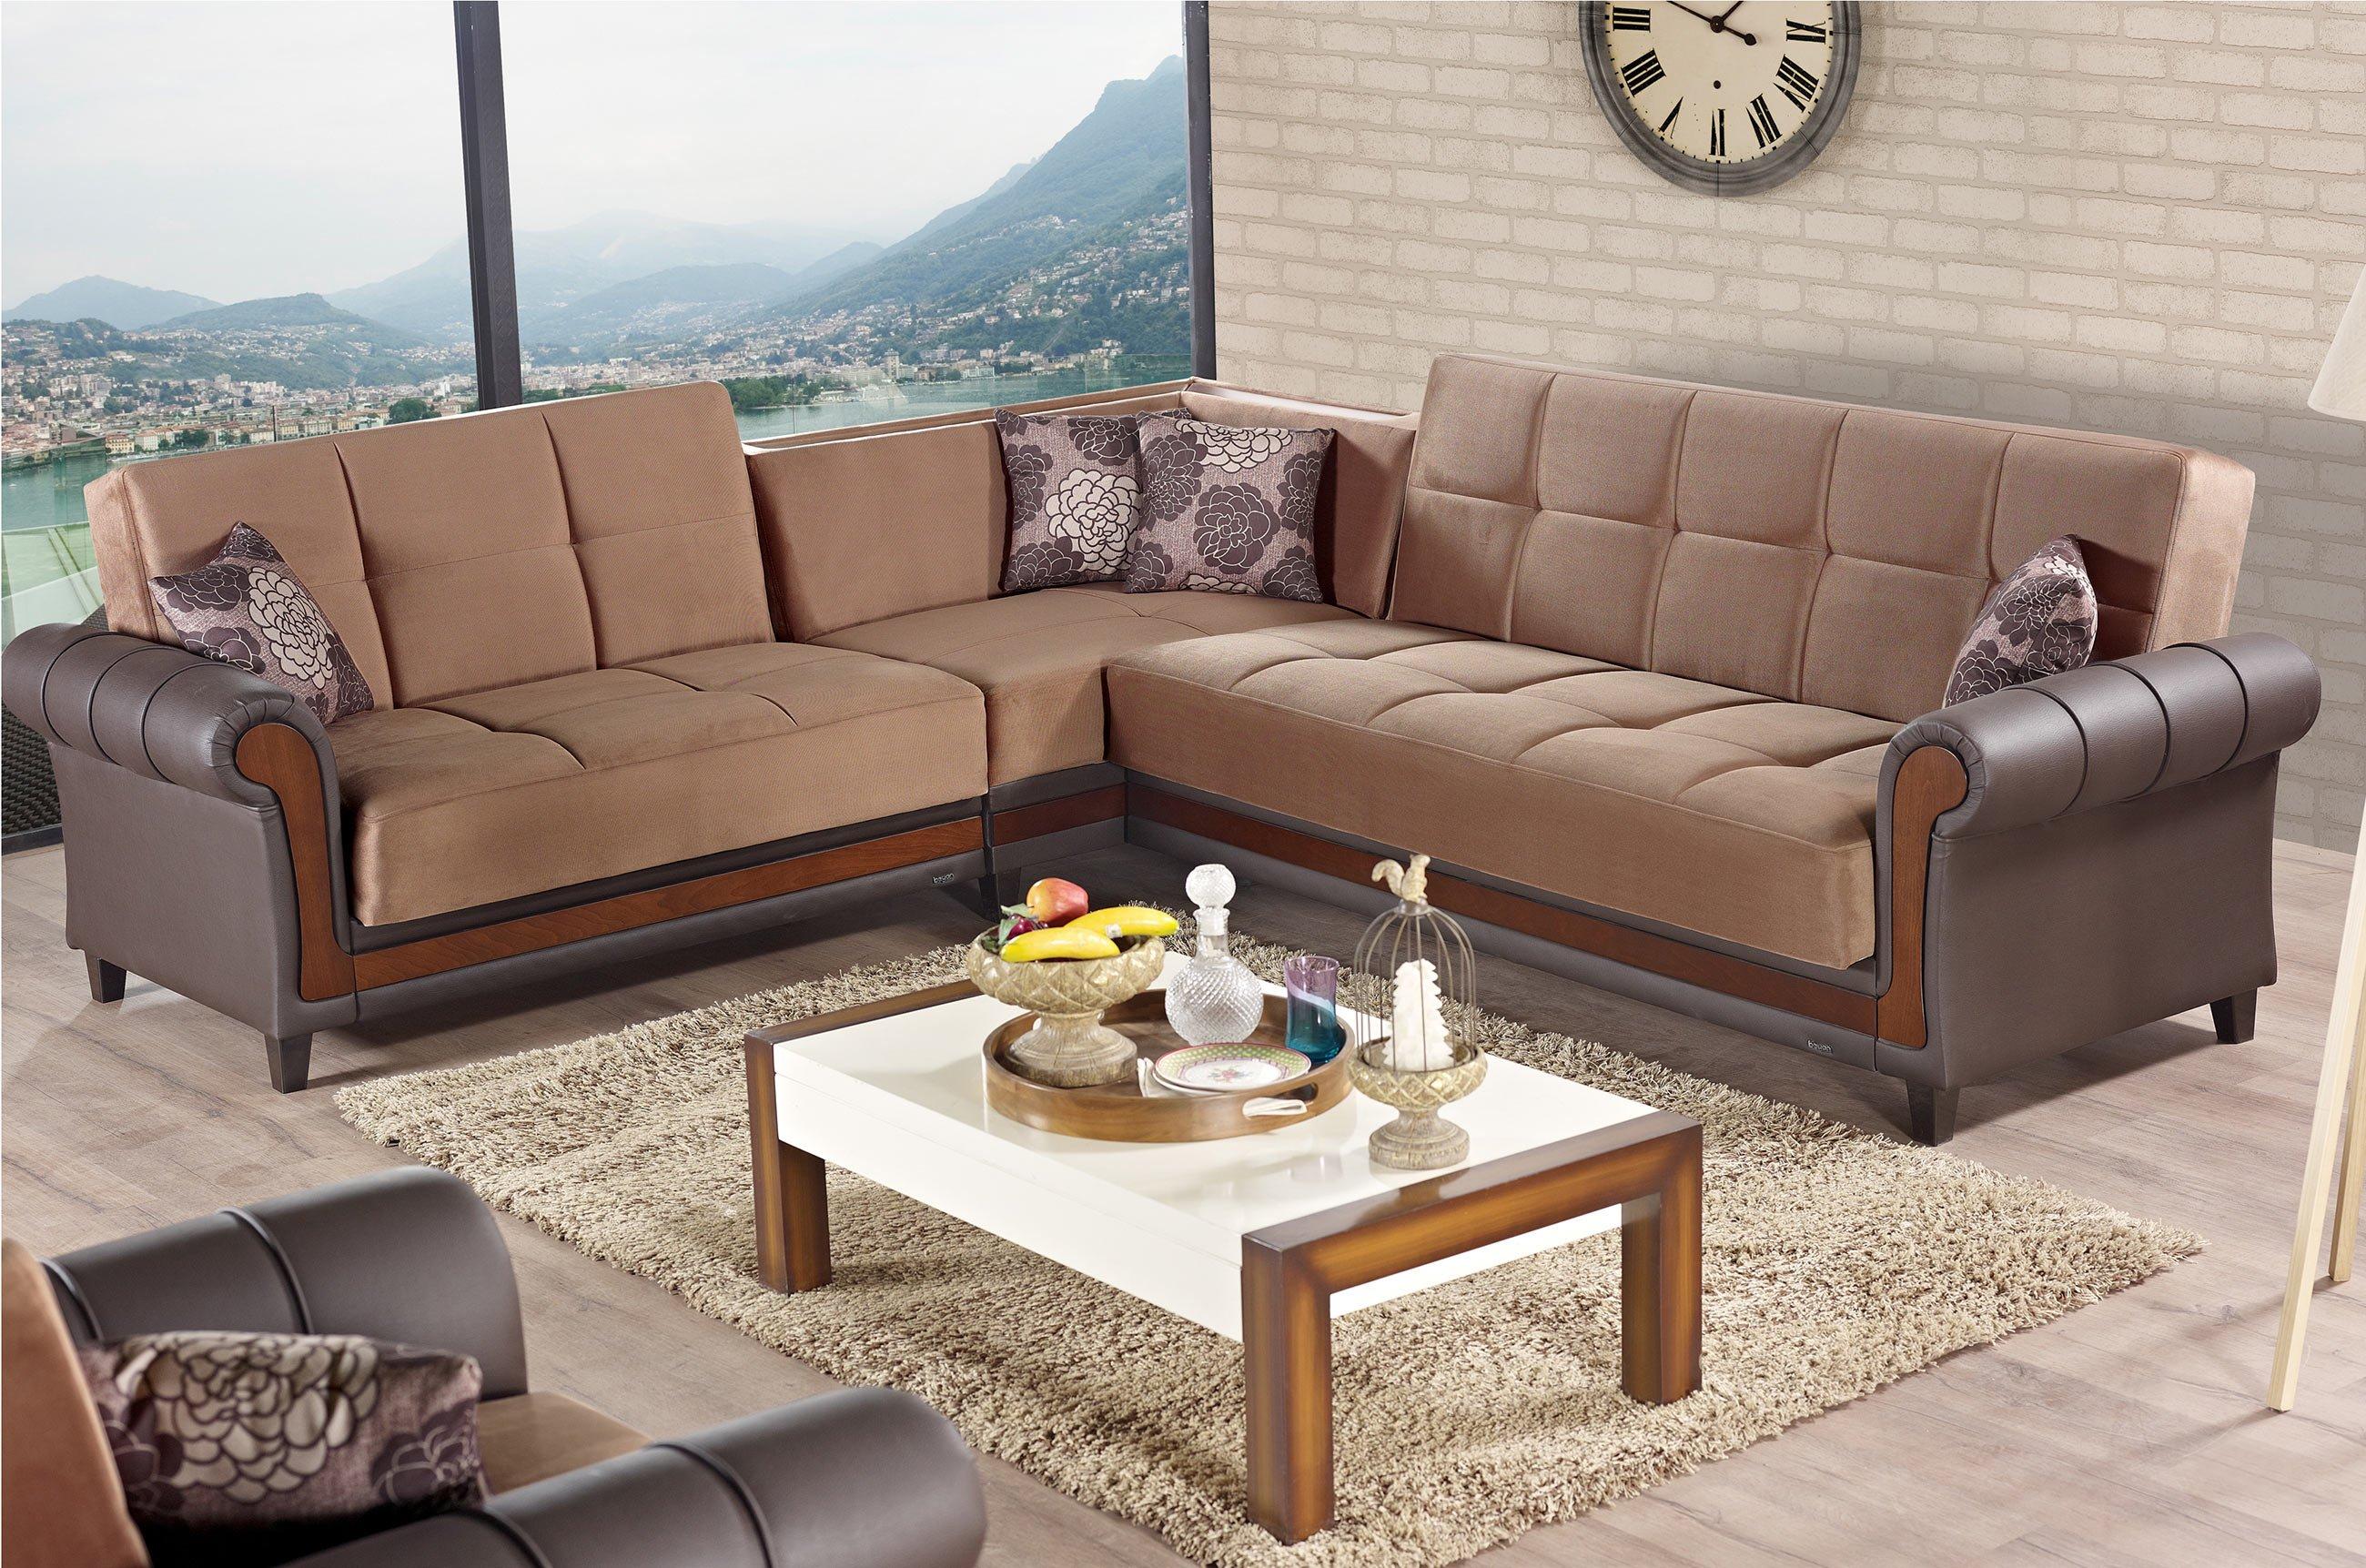 Brown Fabric Sectional Sofa Fabric Sectional Sofa Tos Anm9619 3